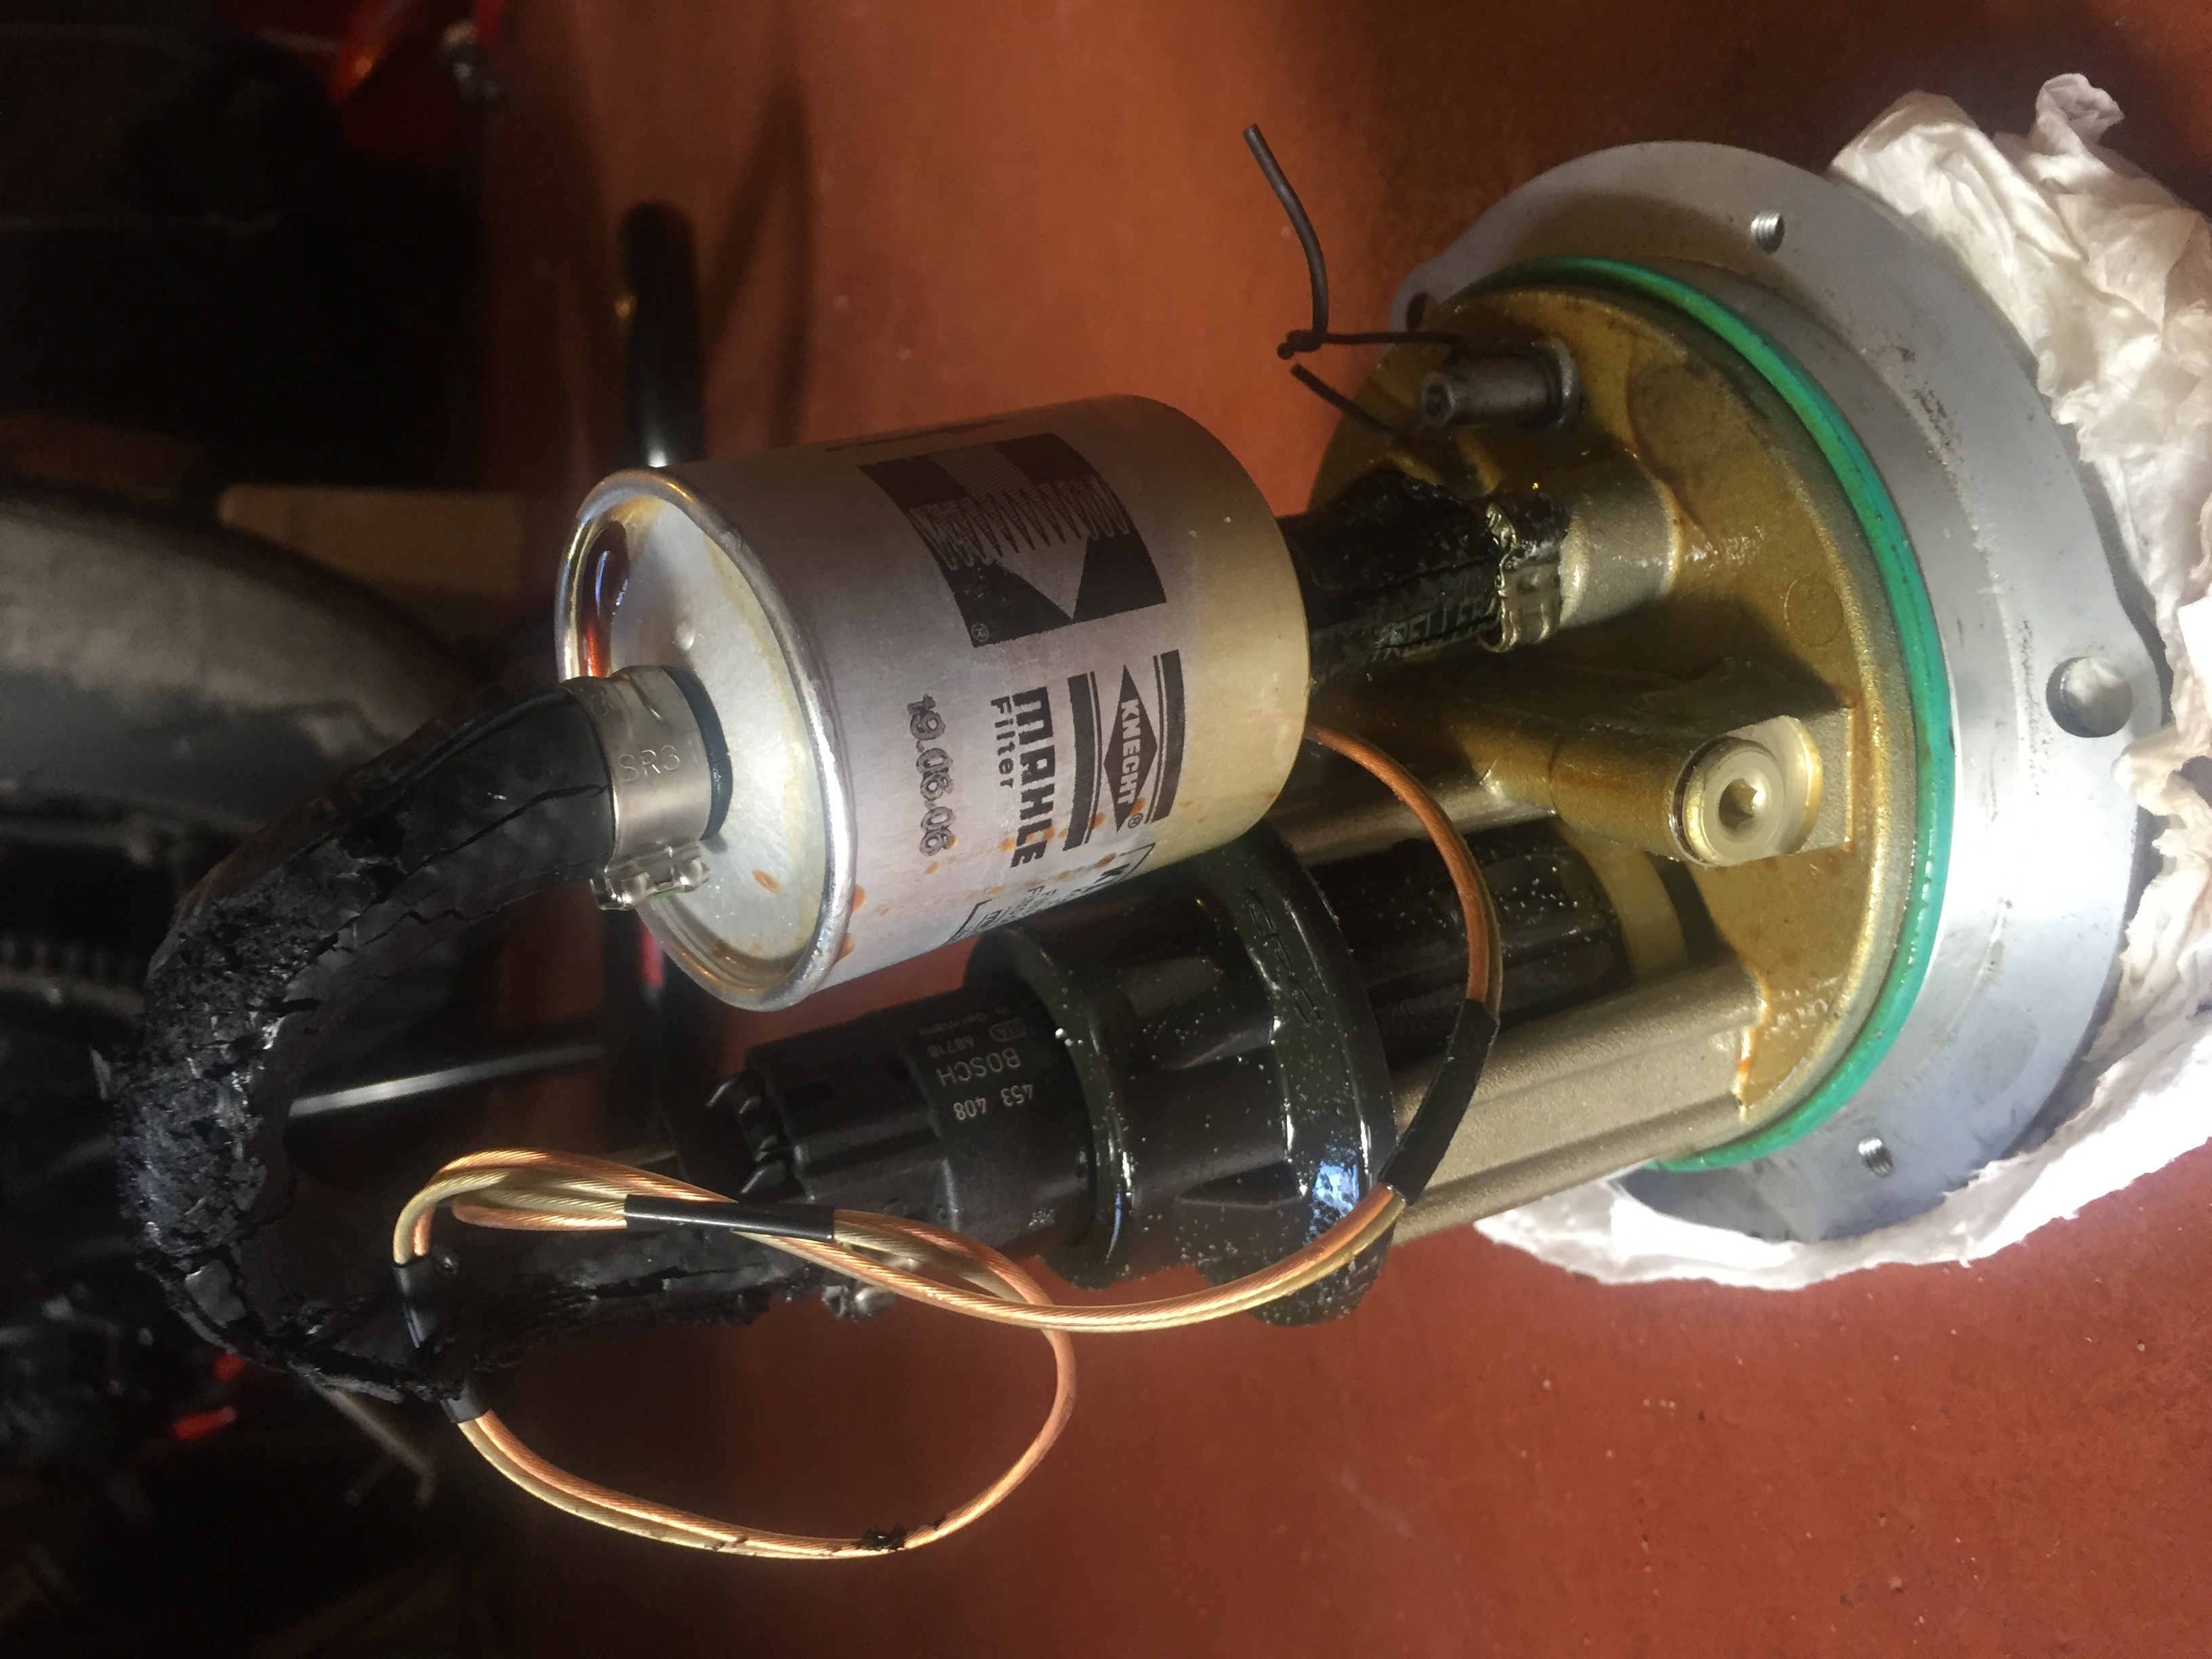 2007 MV F4 R fuel pump replace - MVAgusta net